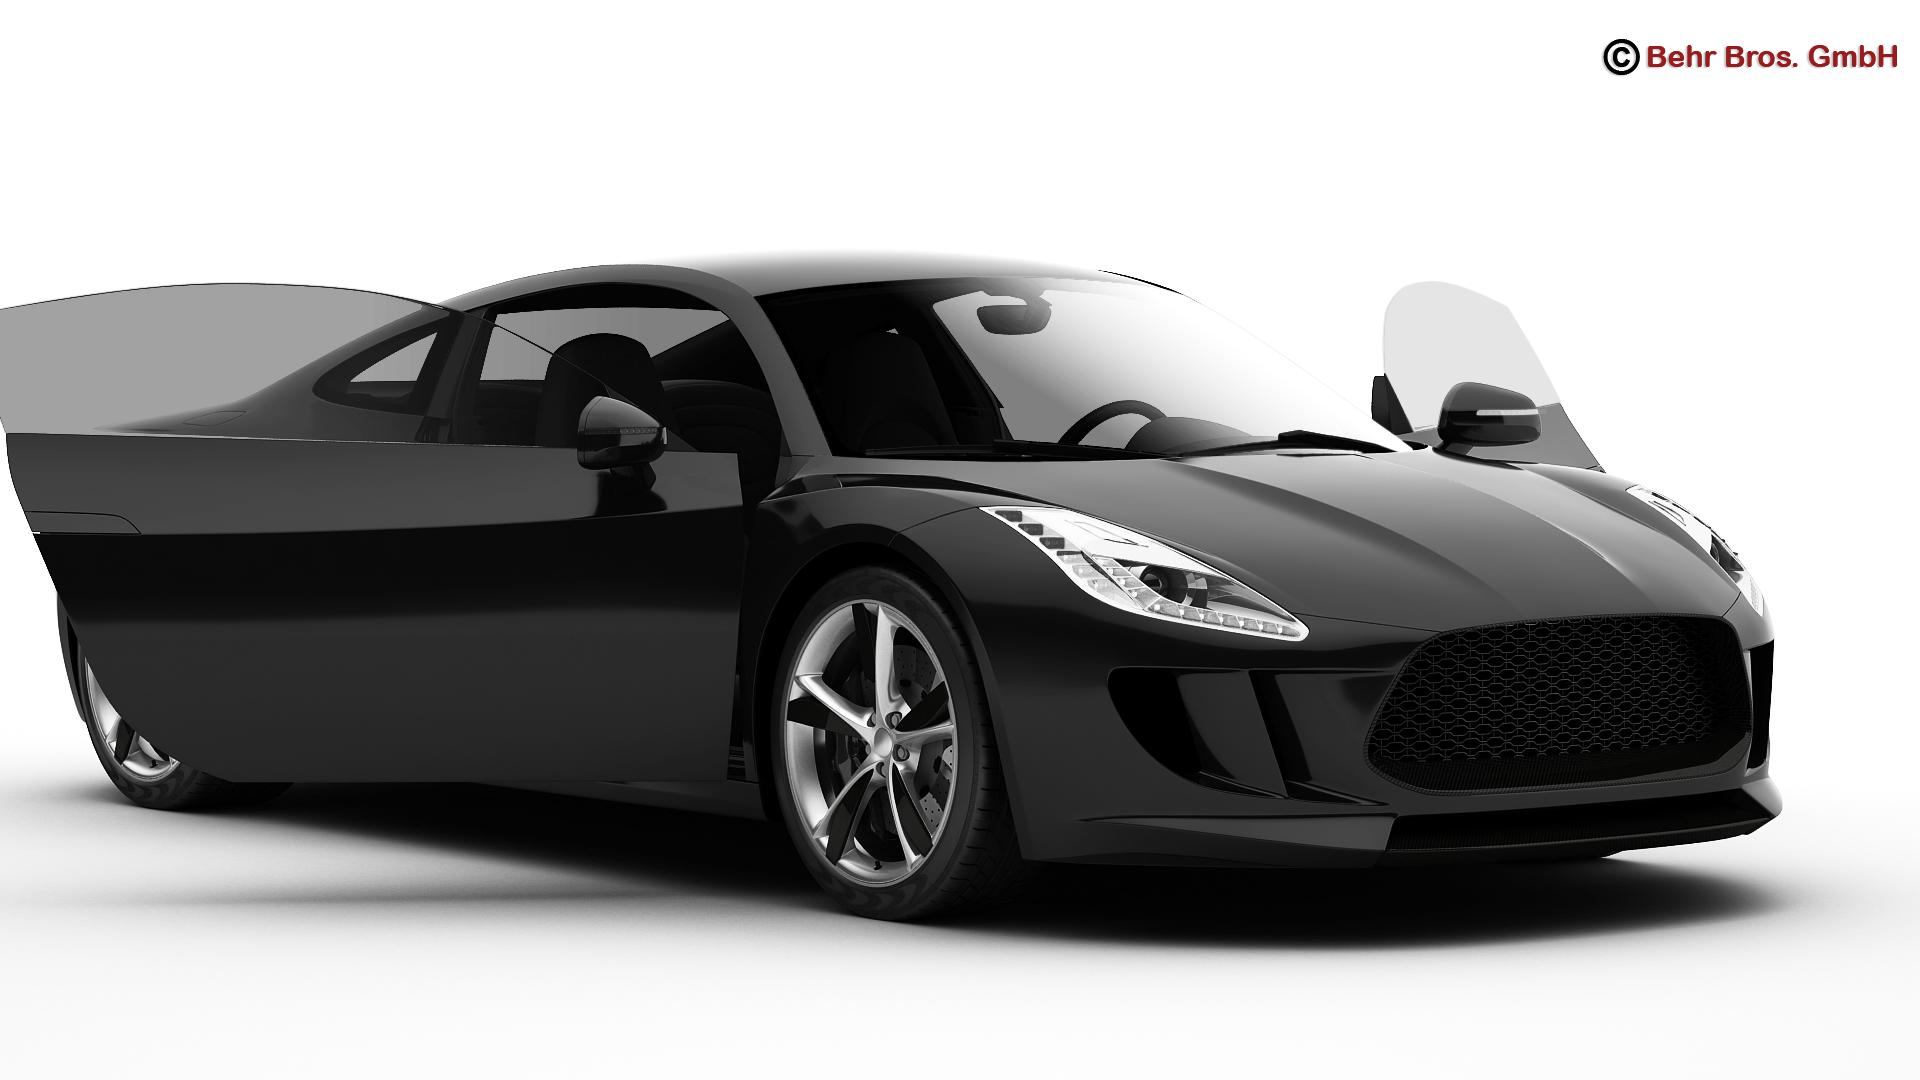 generic sports car 3d model 3ds max fbx c4d lwo ma mb obj 160520